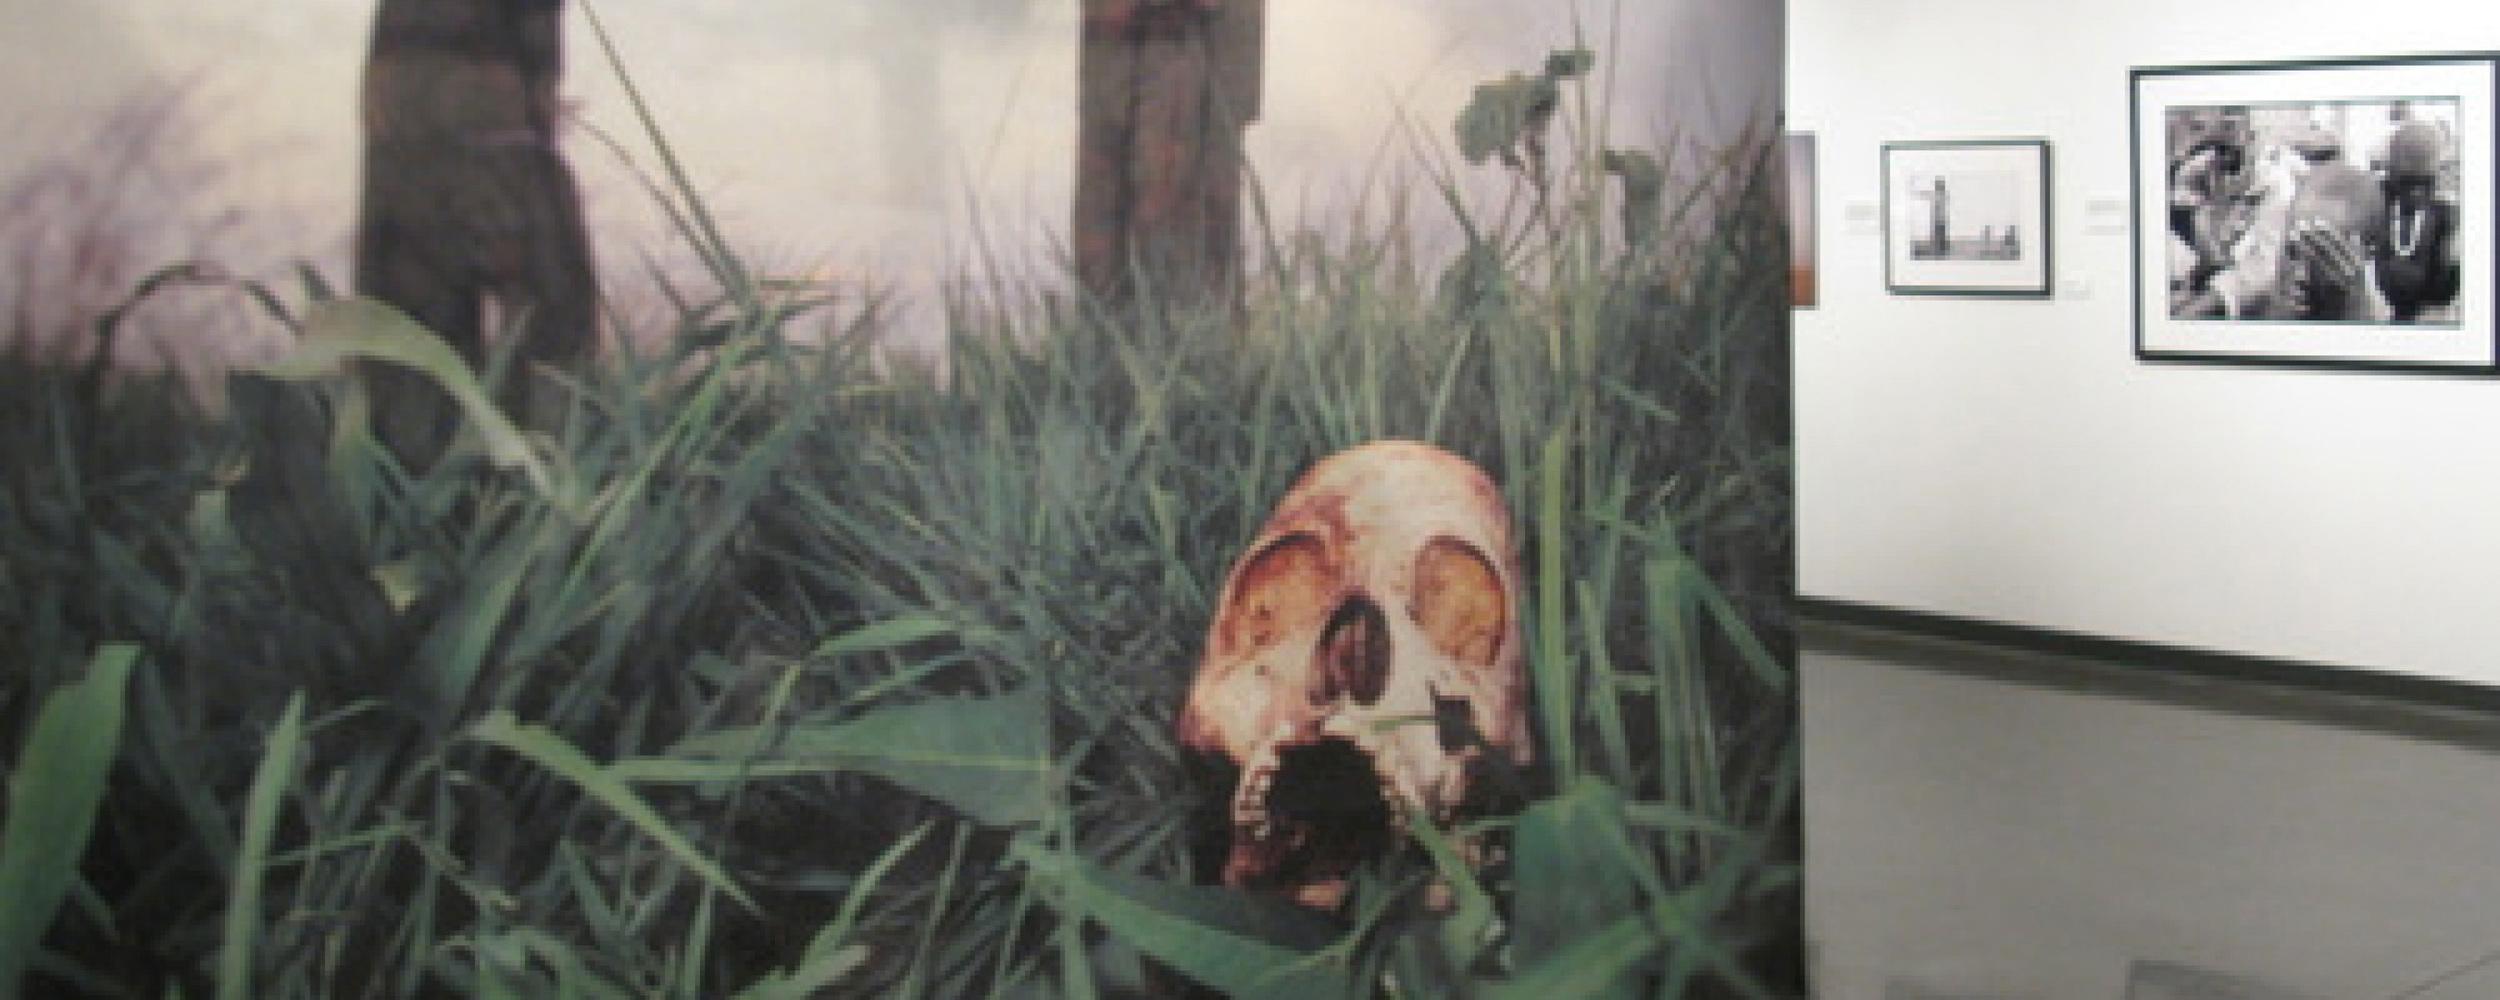 Darfur_Illonois_holocaust_museum_01.jpg